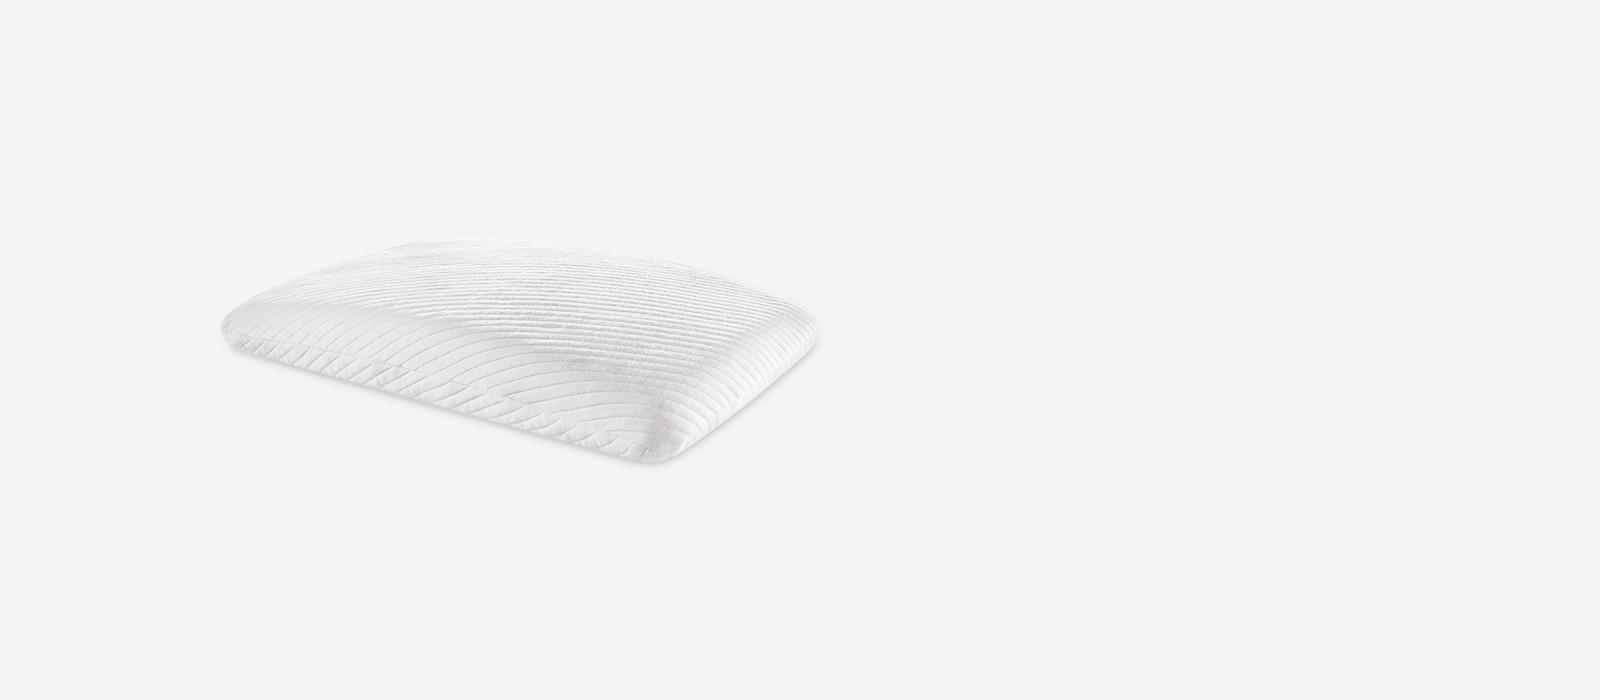 tempur essential support pillow tempur pedic. Black Bedroom Furniture Sets. Home Design Ideas